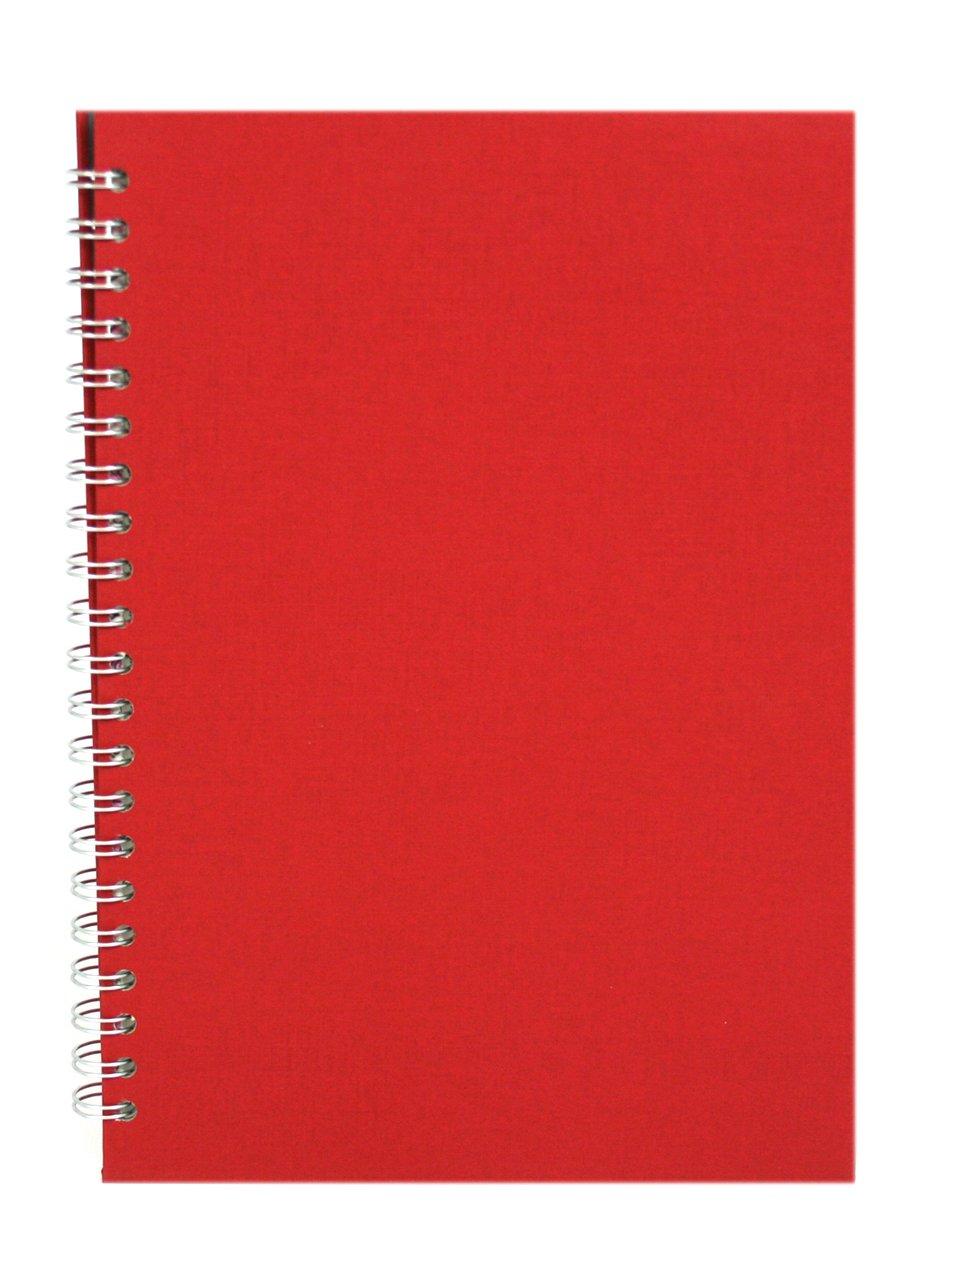 Pink Pig A4 Portrait Sketchbook | White Cartridge, 35 Leaves | Economy Ivory The-Pink-Pig.Co.Uk Ltd 74455